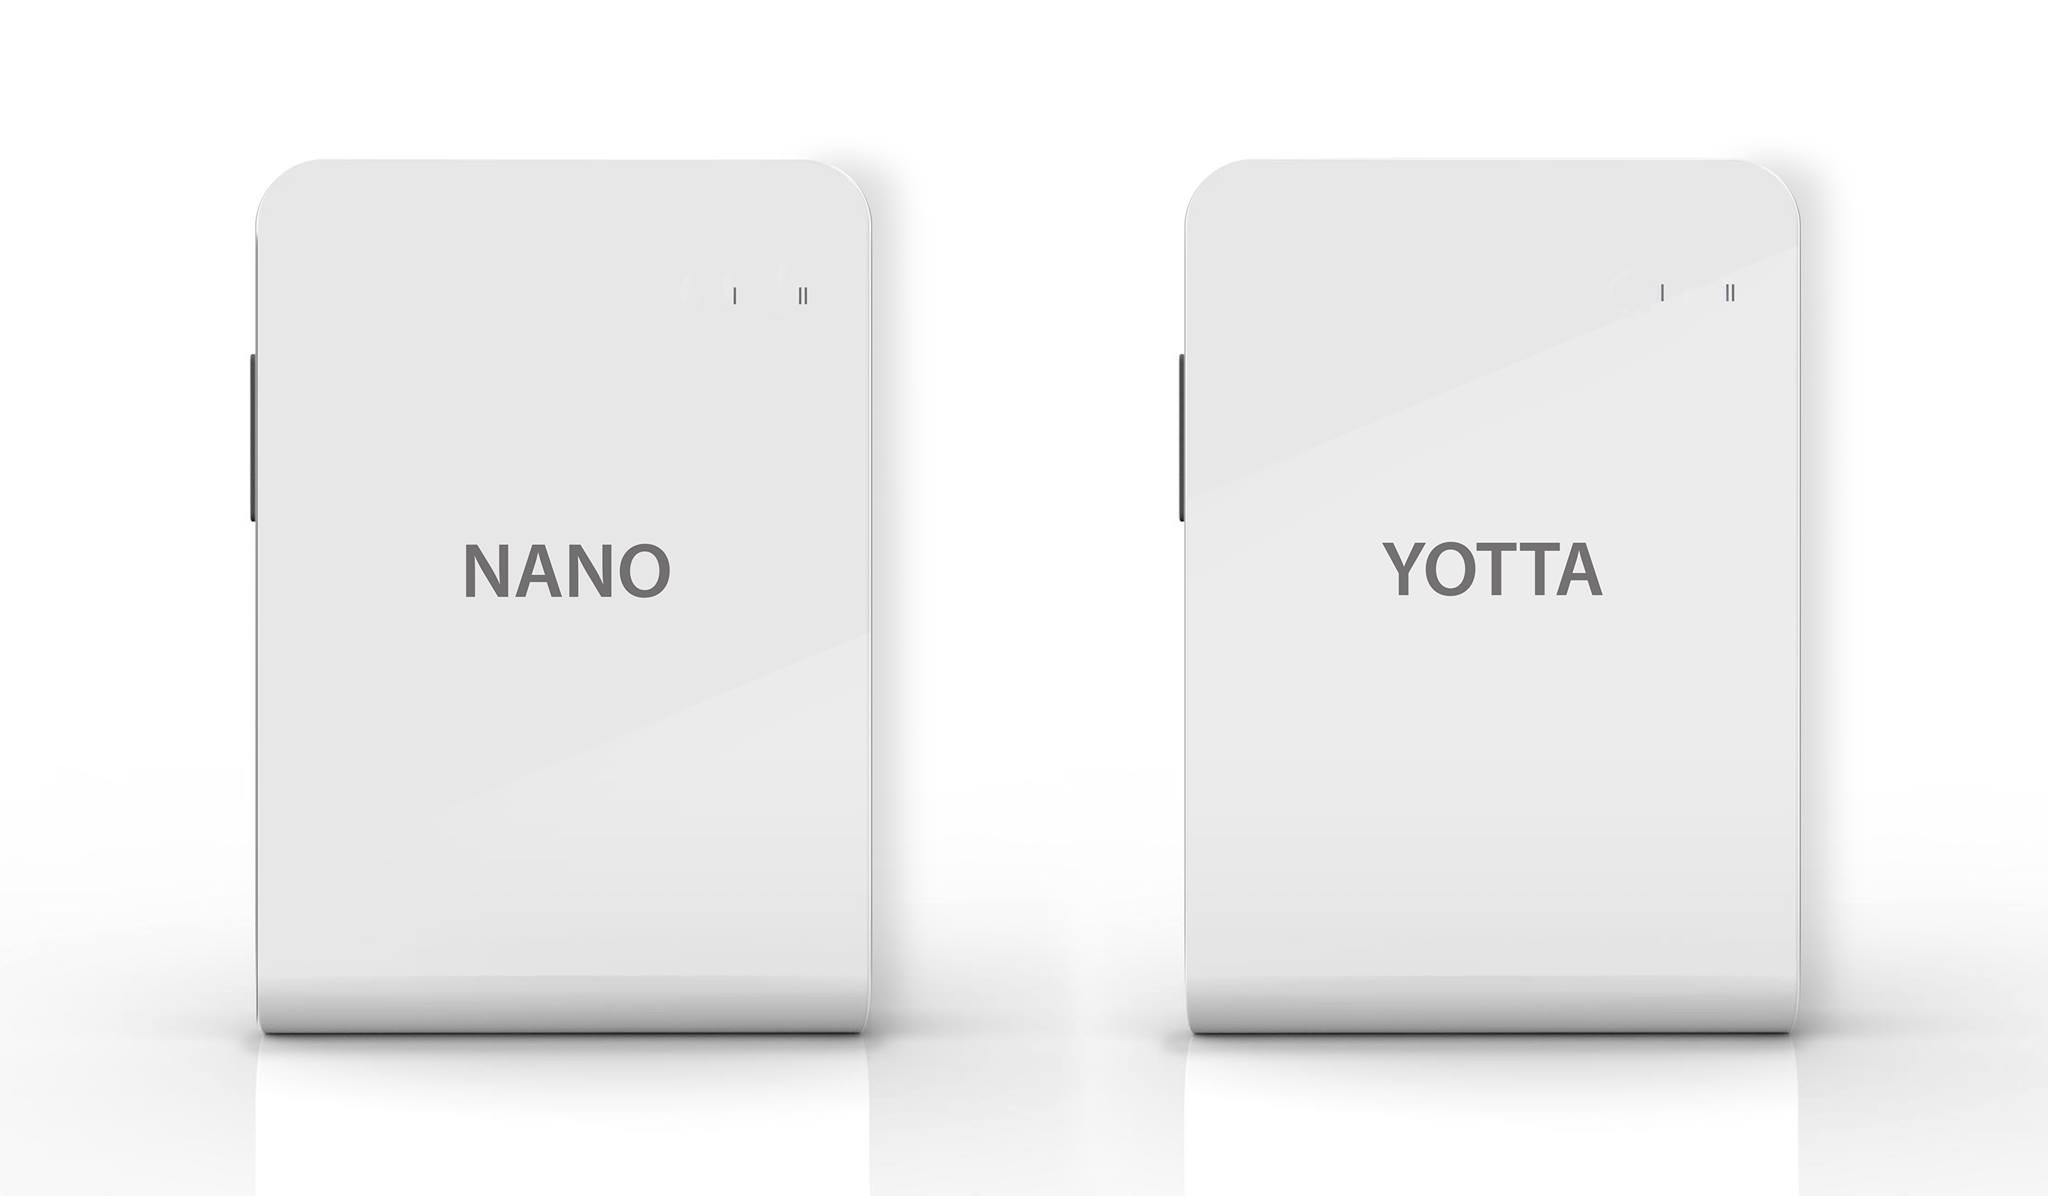 Twinstar2 Nano i Twinstar2 Yotta